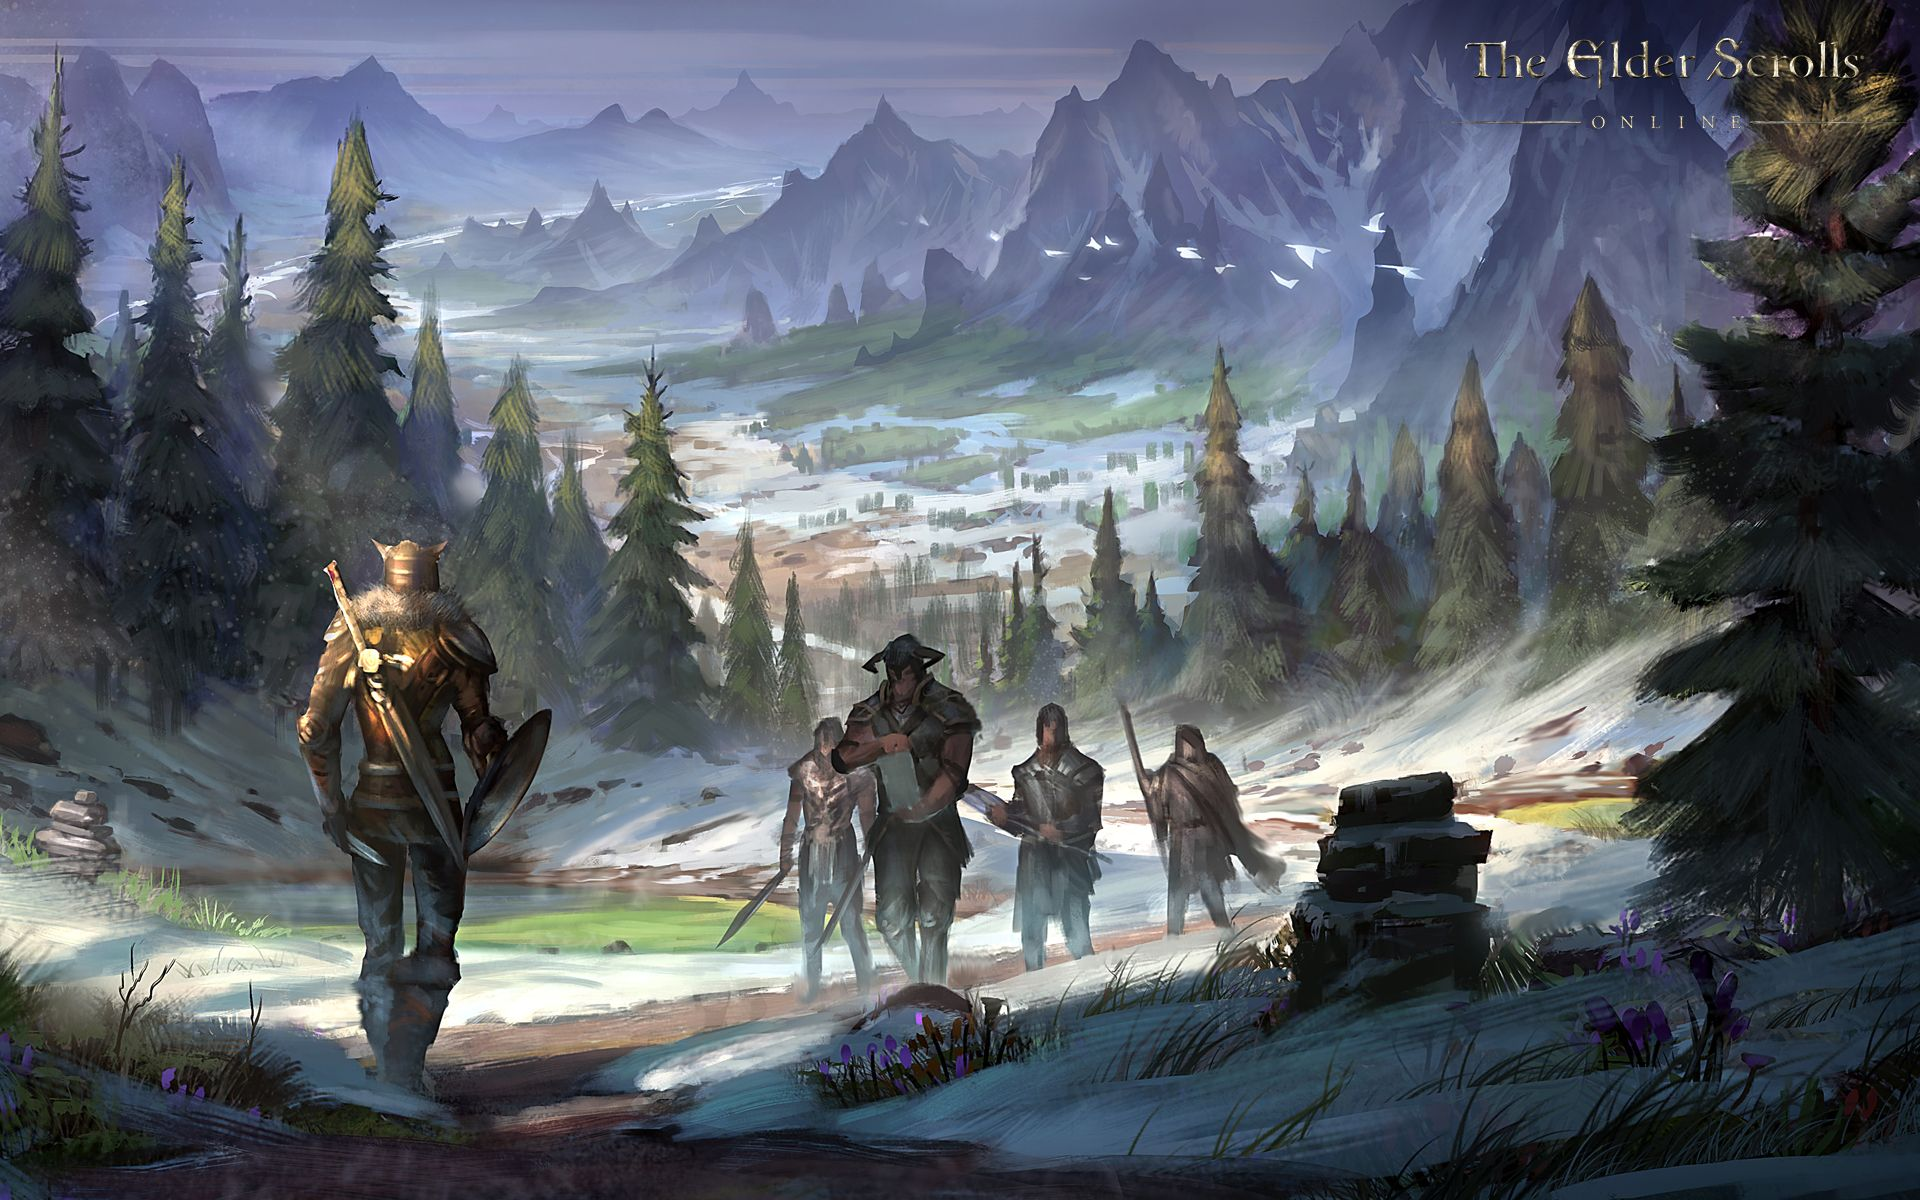 Wallpaper From The Elder Scrolls Online Skyrim Concept Art